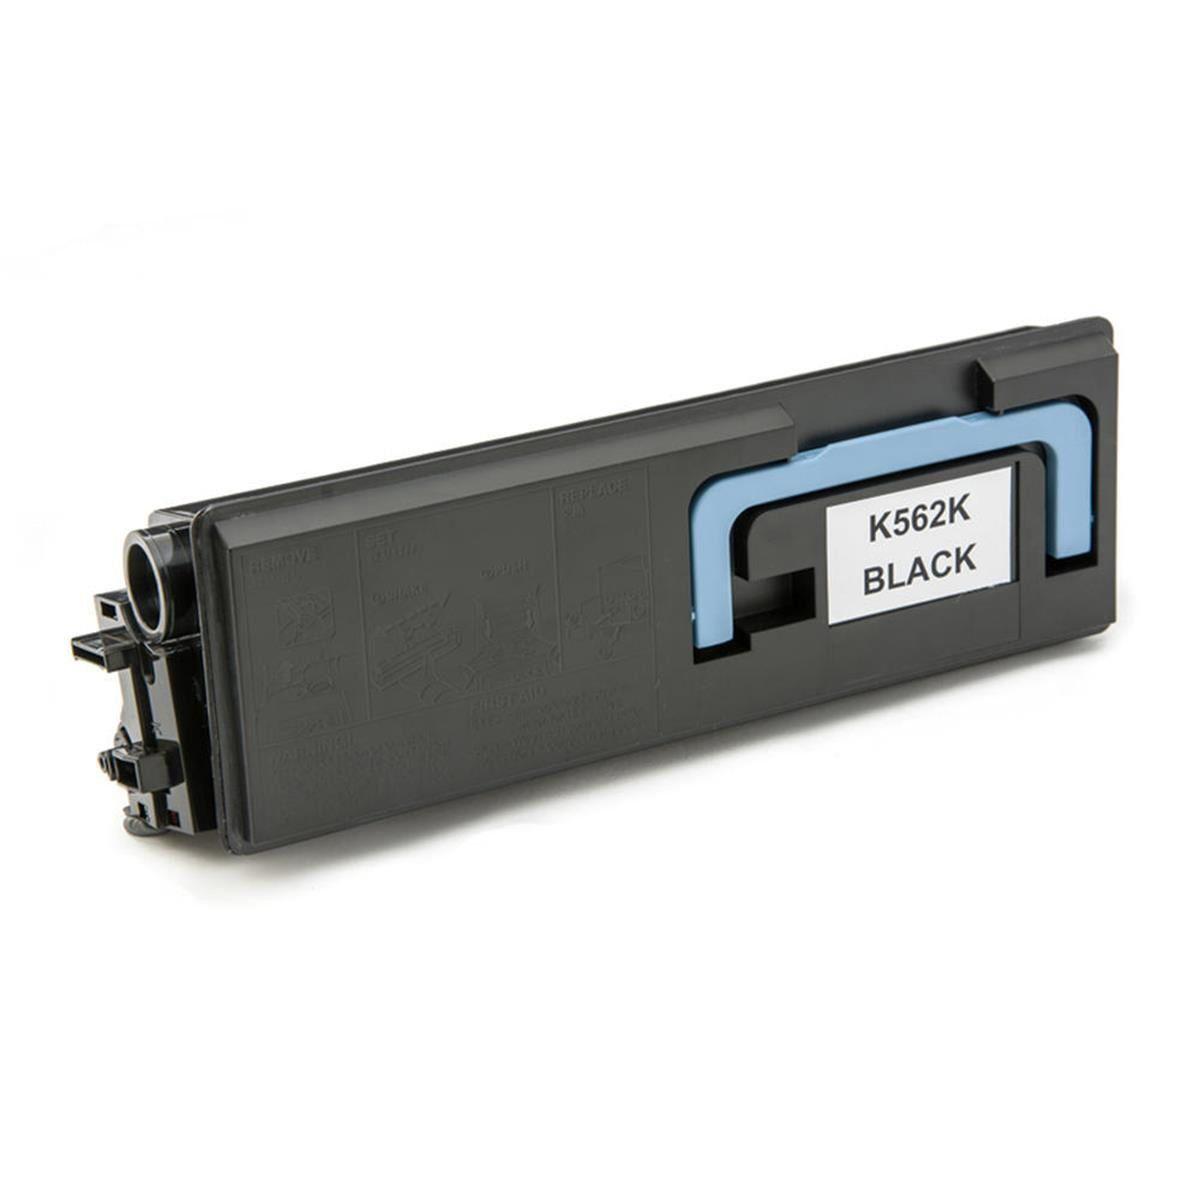 Compatível: Toner TK-562K TK562 para Kyocera FS-C5300 FS-C5350 FS-C5300dn FS-C5350dn FSC5300 FSC5350 / Preto / 12.000